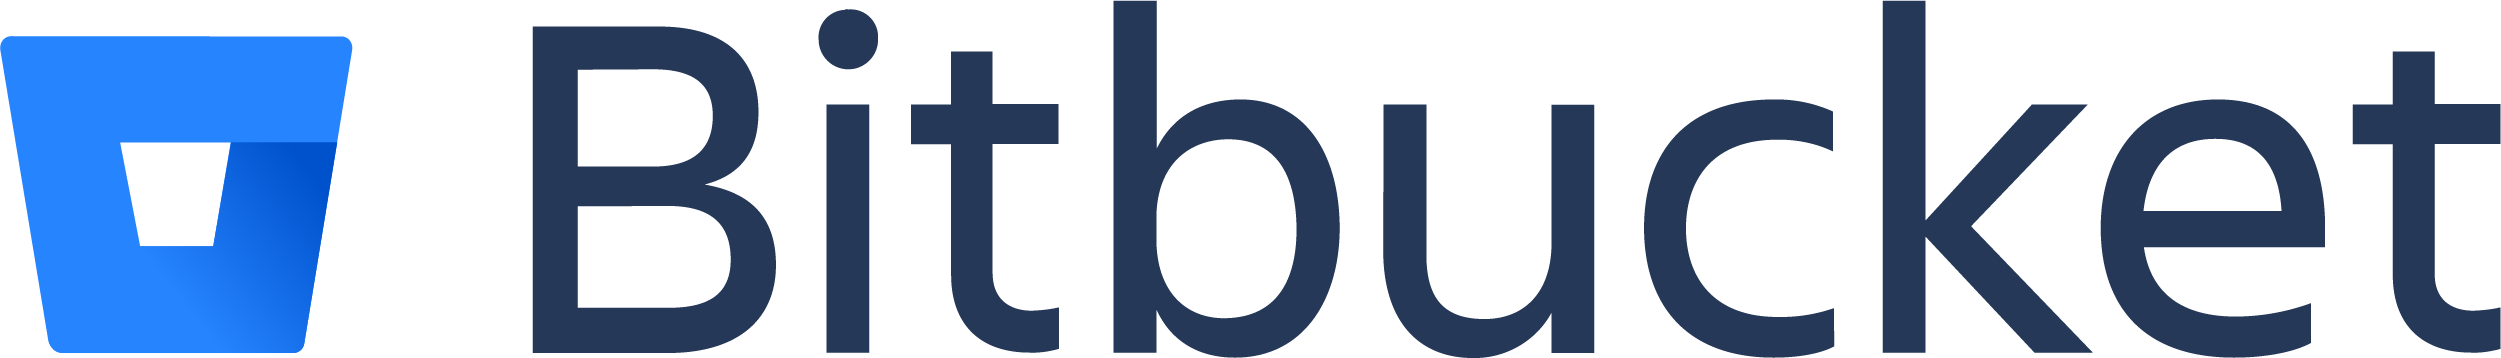 https://whiz-cloud.com/wp-content/uploads/2021/06/bitbucket-vector-logo.png